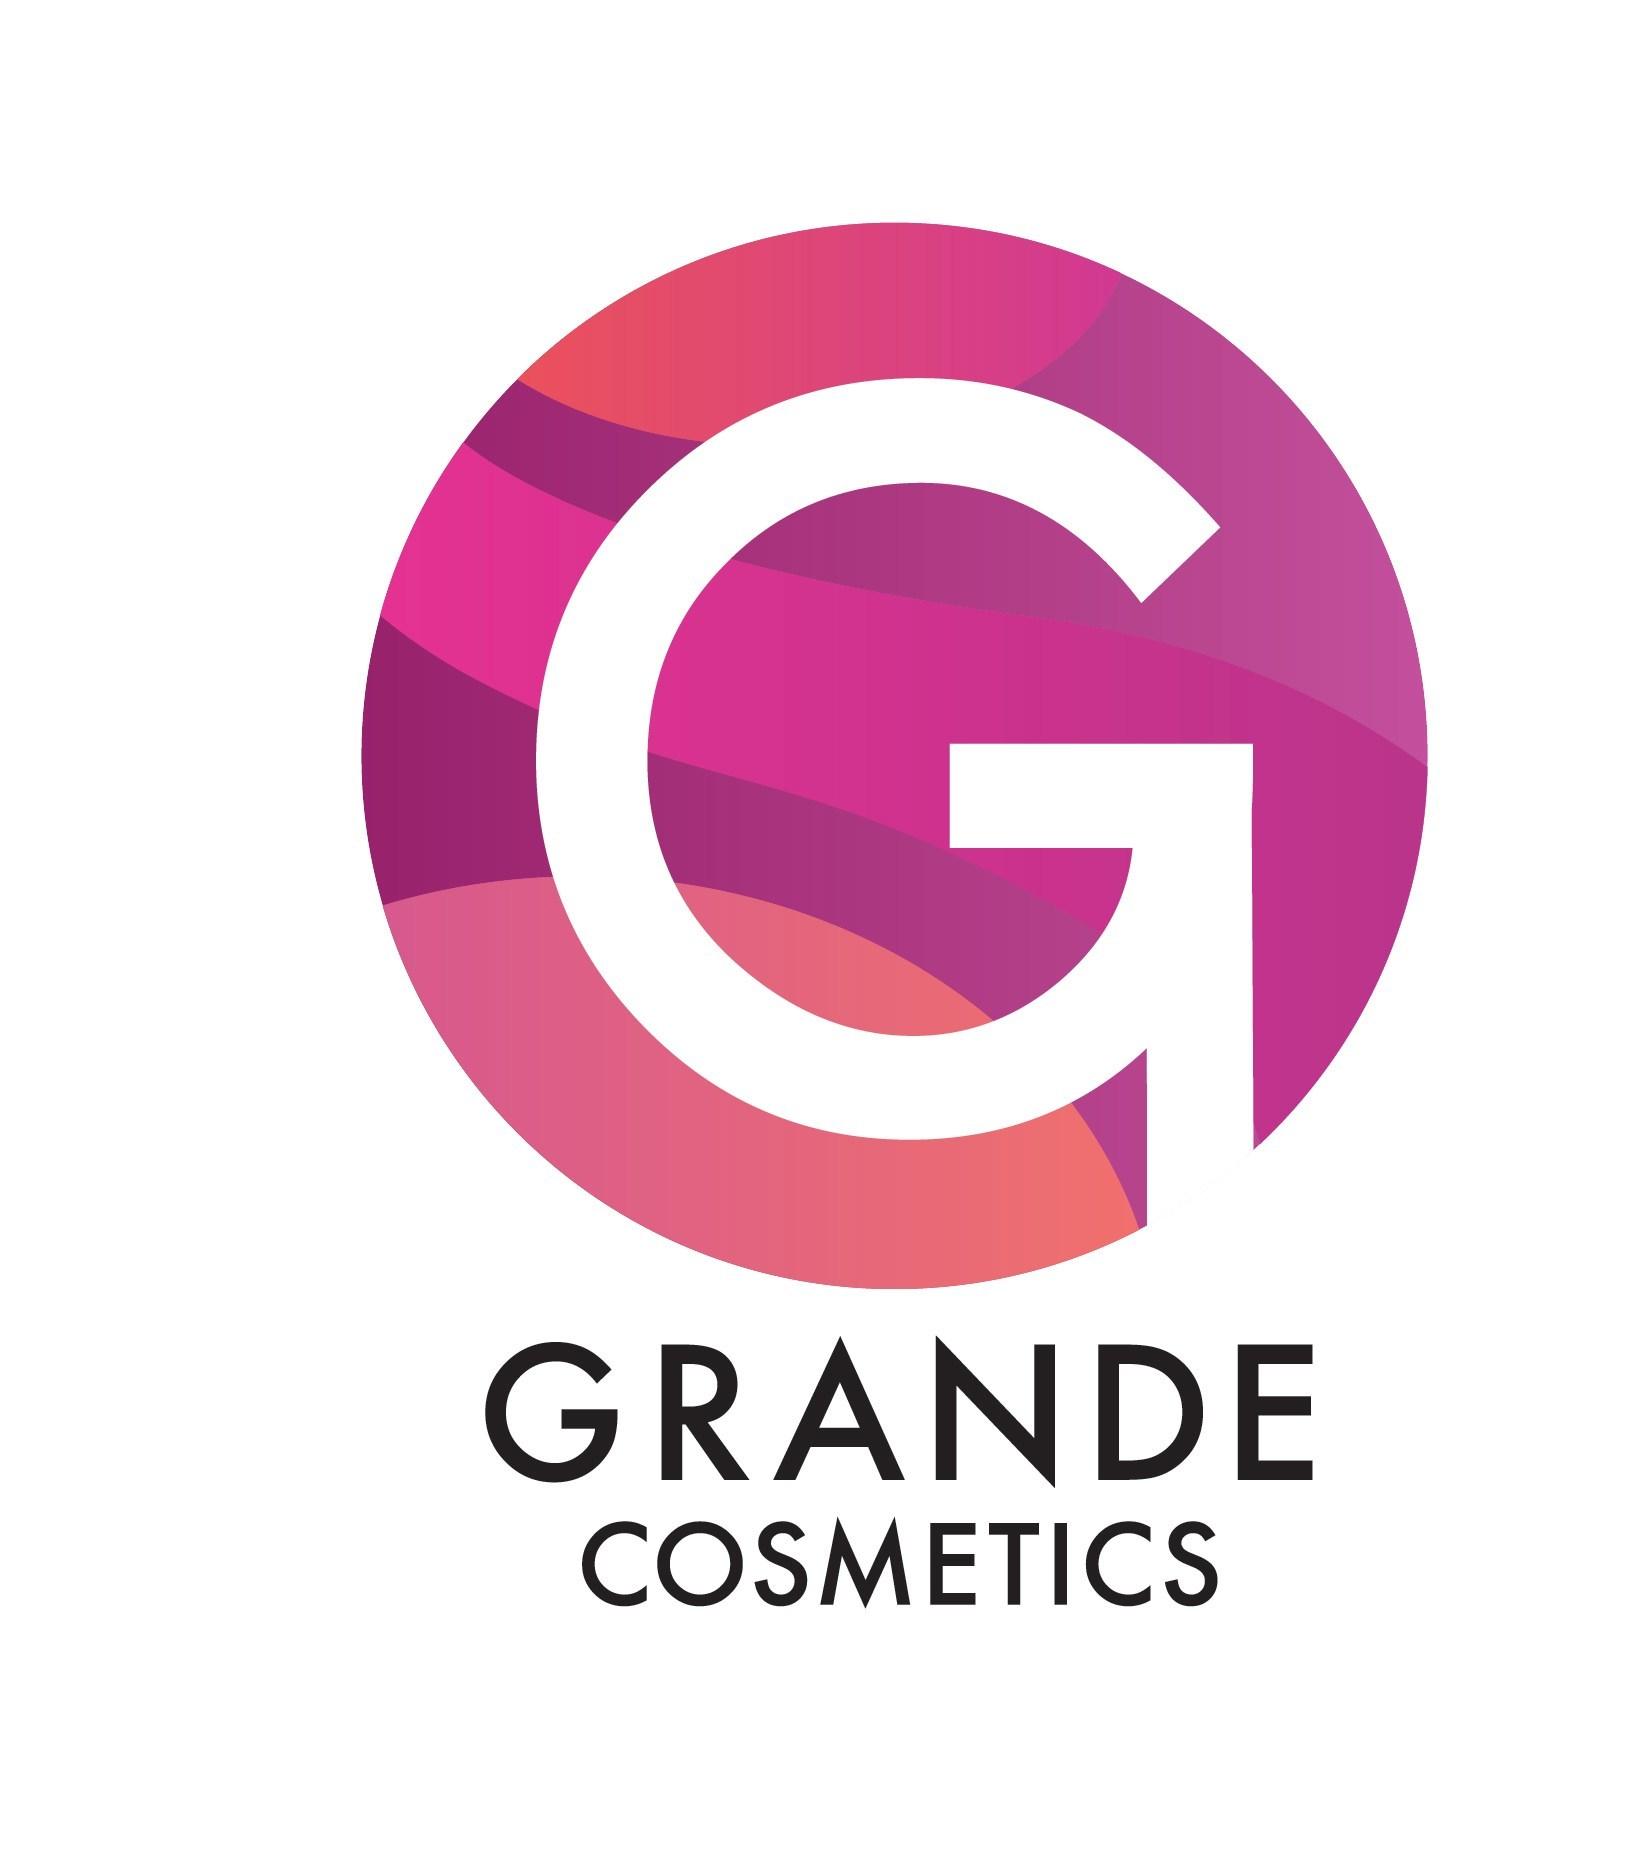 (PRNewsfoto/Grande Cosmetics)